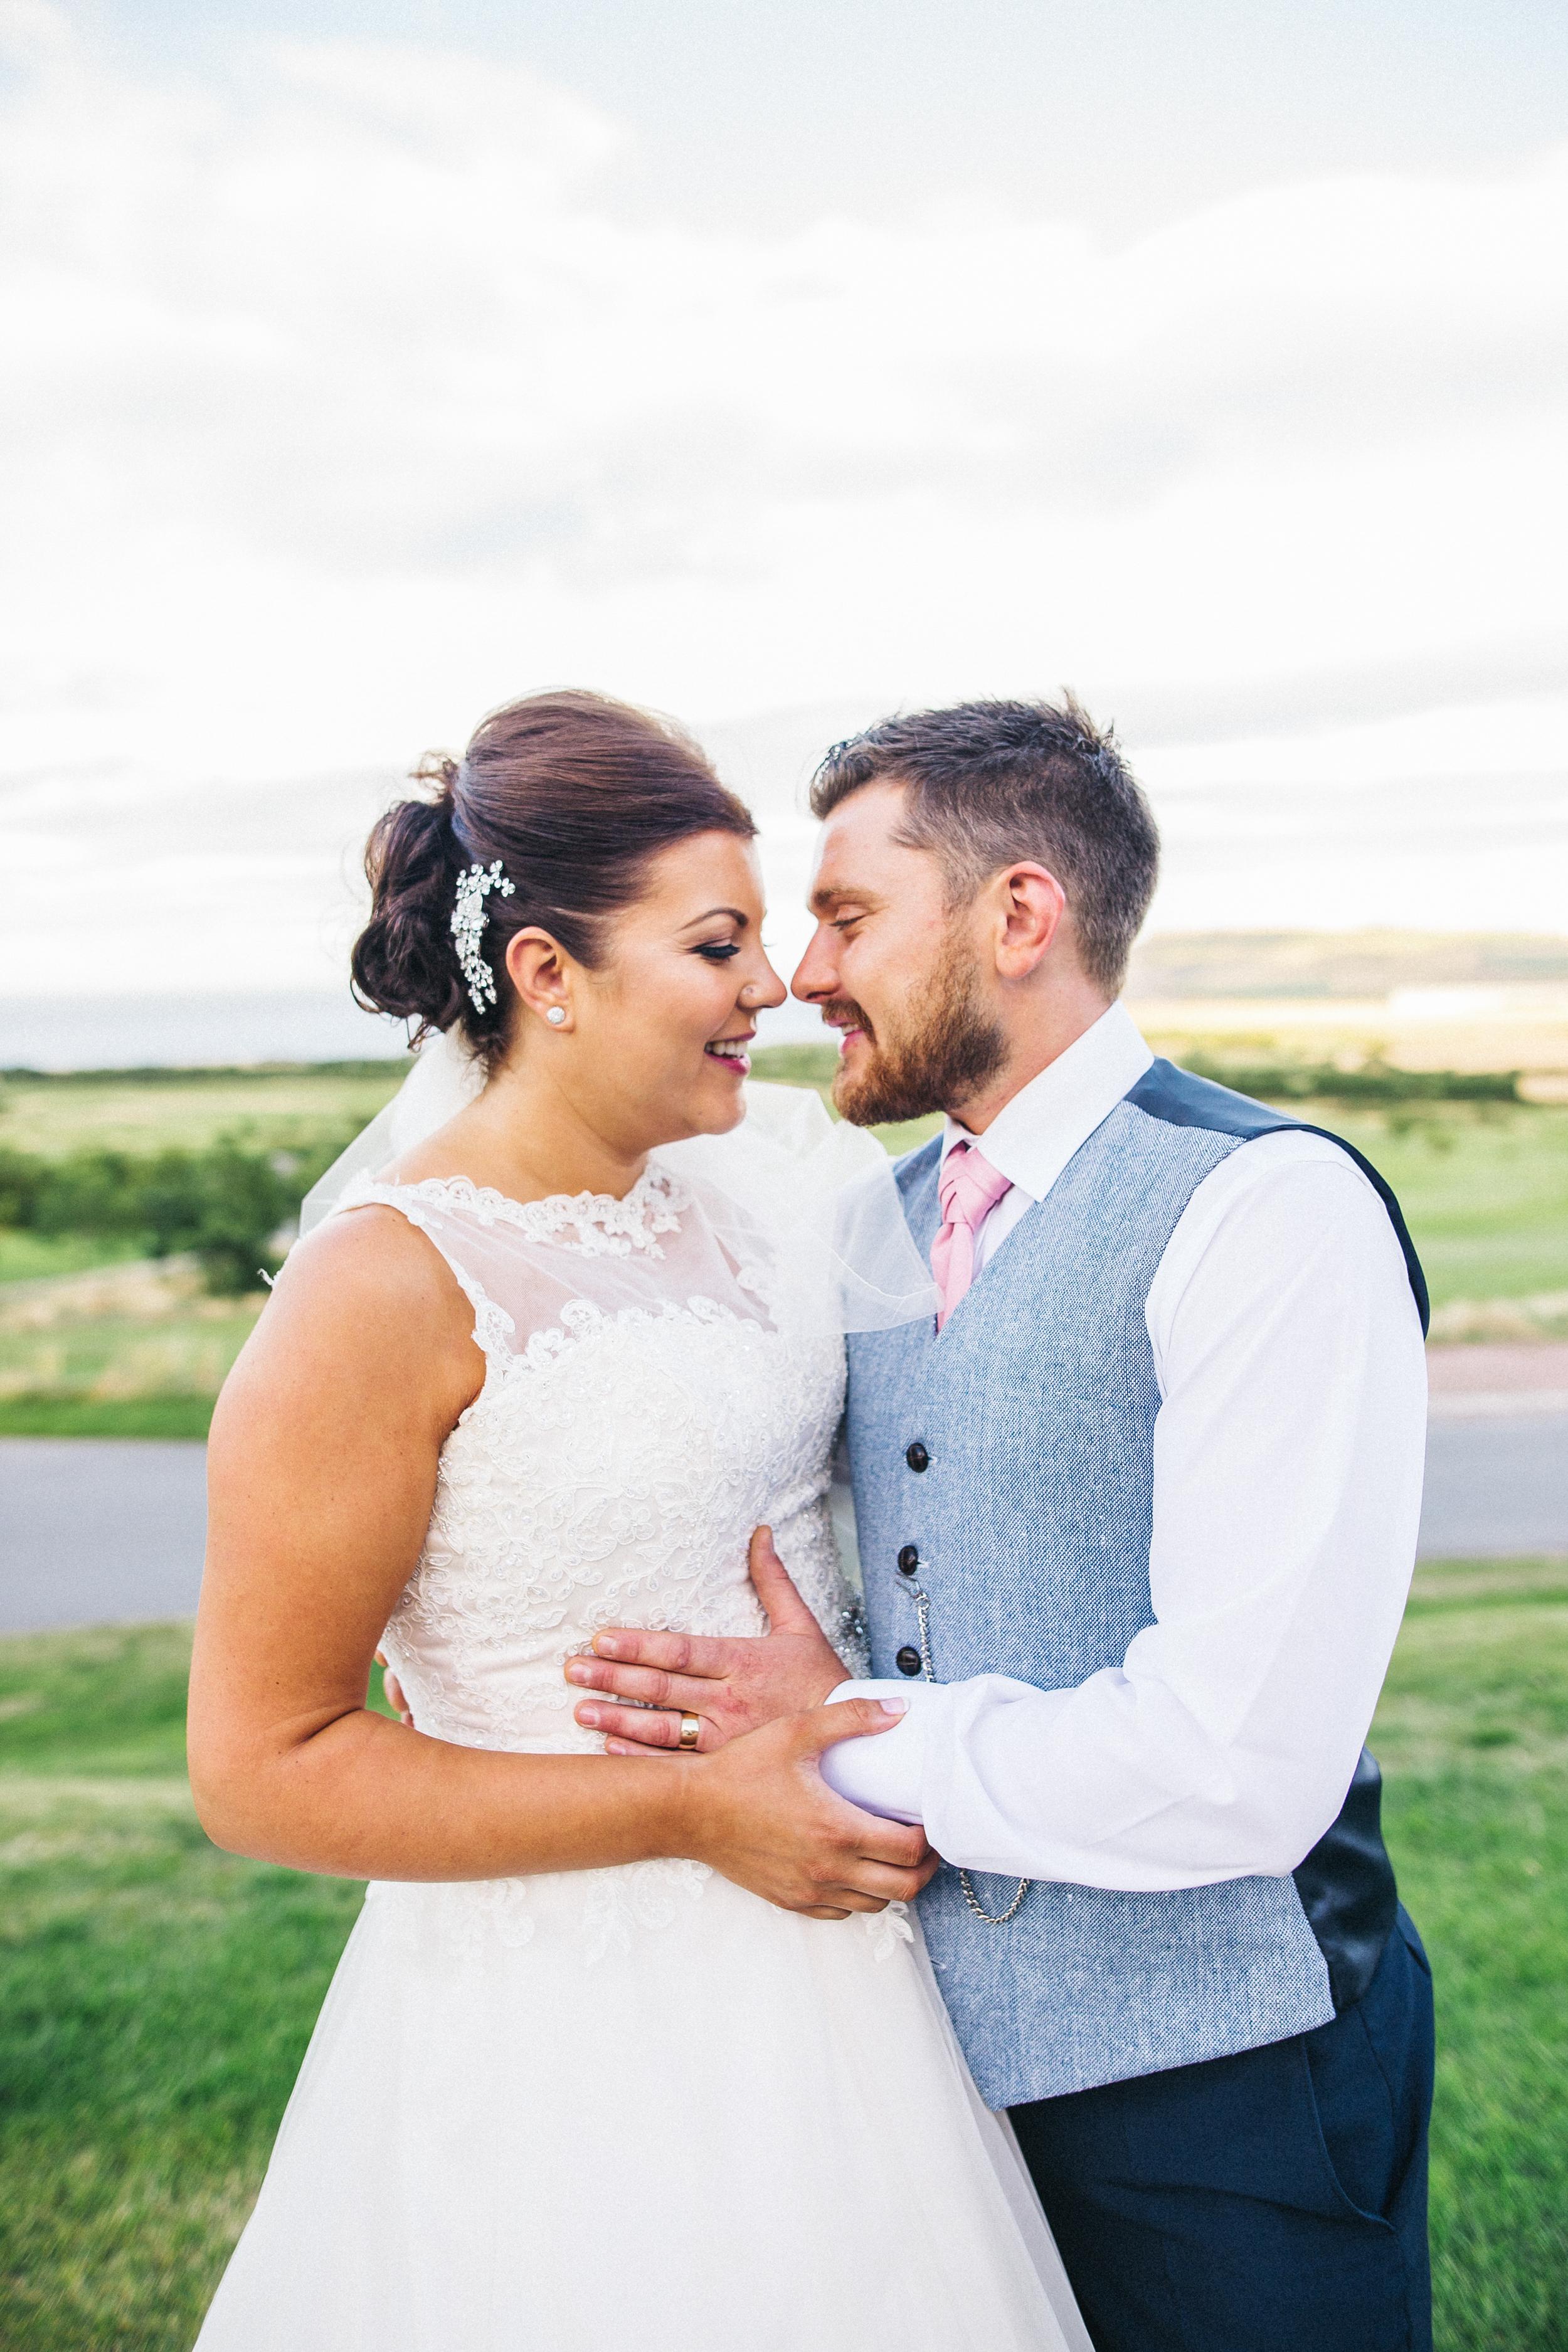 creative-wedding-photography-teesside-north-east-yorkshire-131.jpg